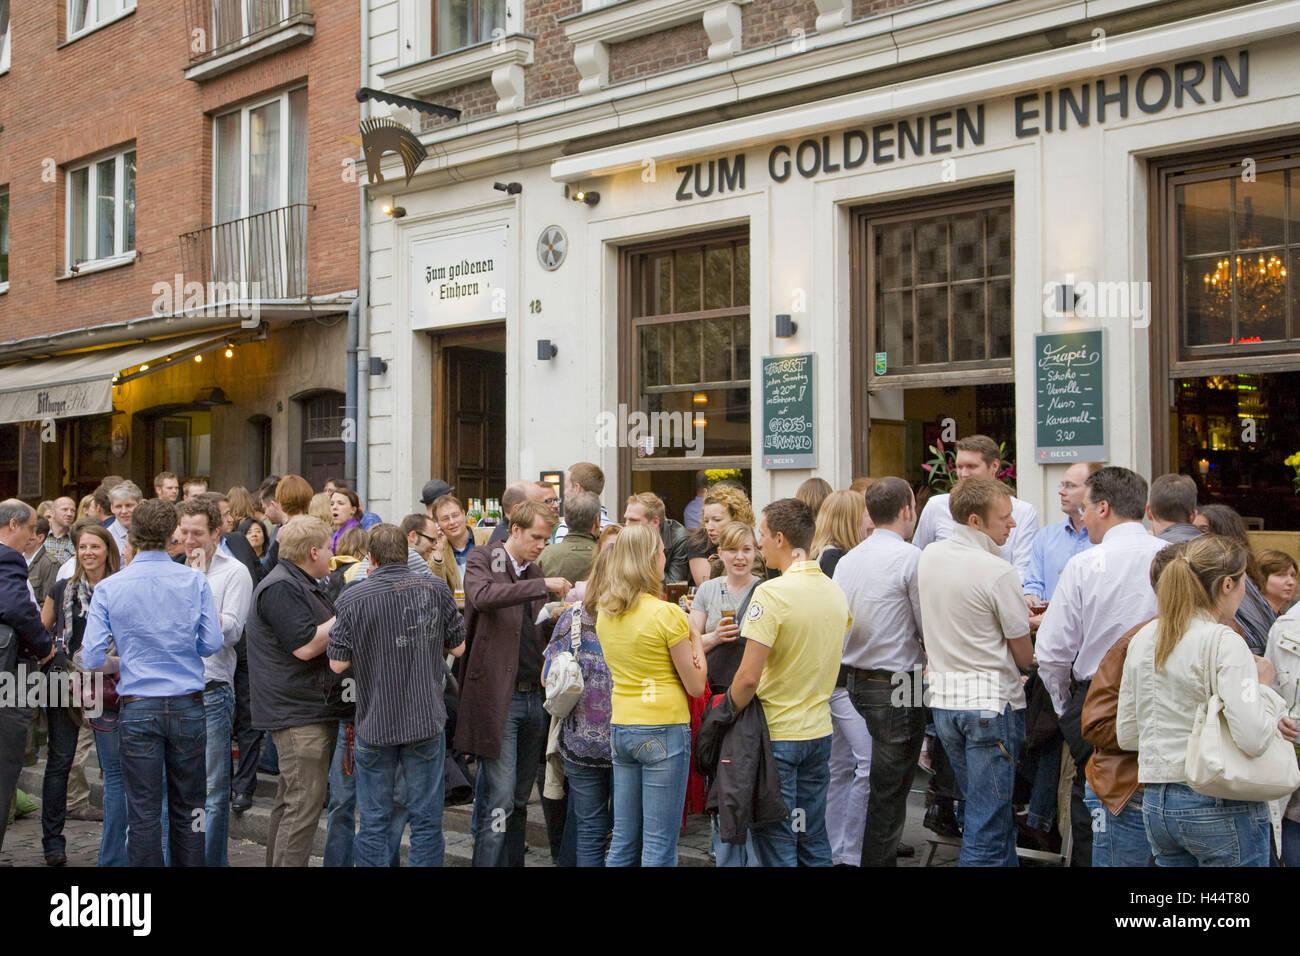 Einhorn Düsseldorf bar to the golden unicorn bar bars in the ratinger